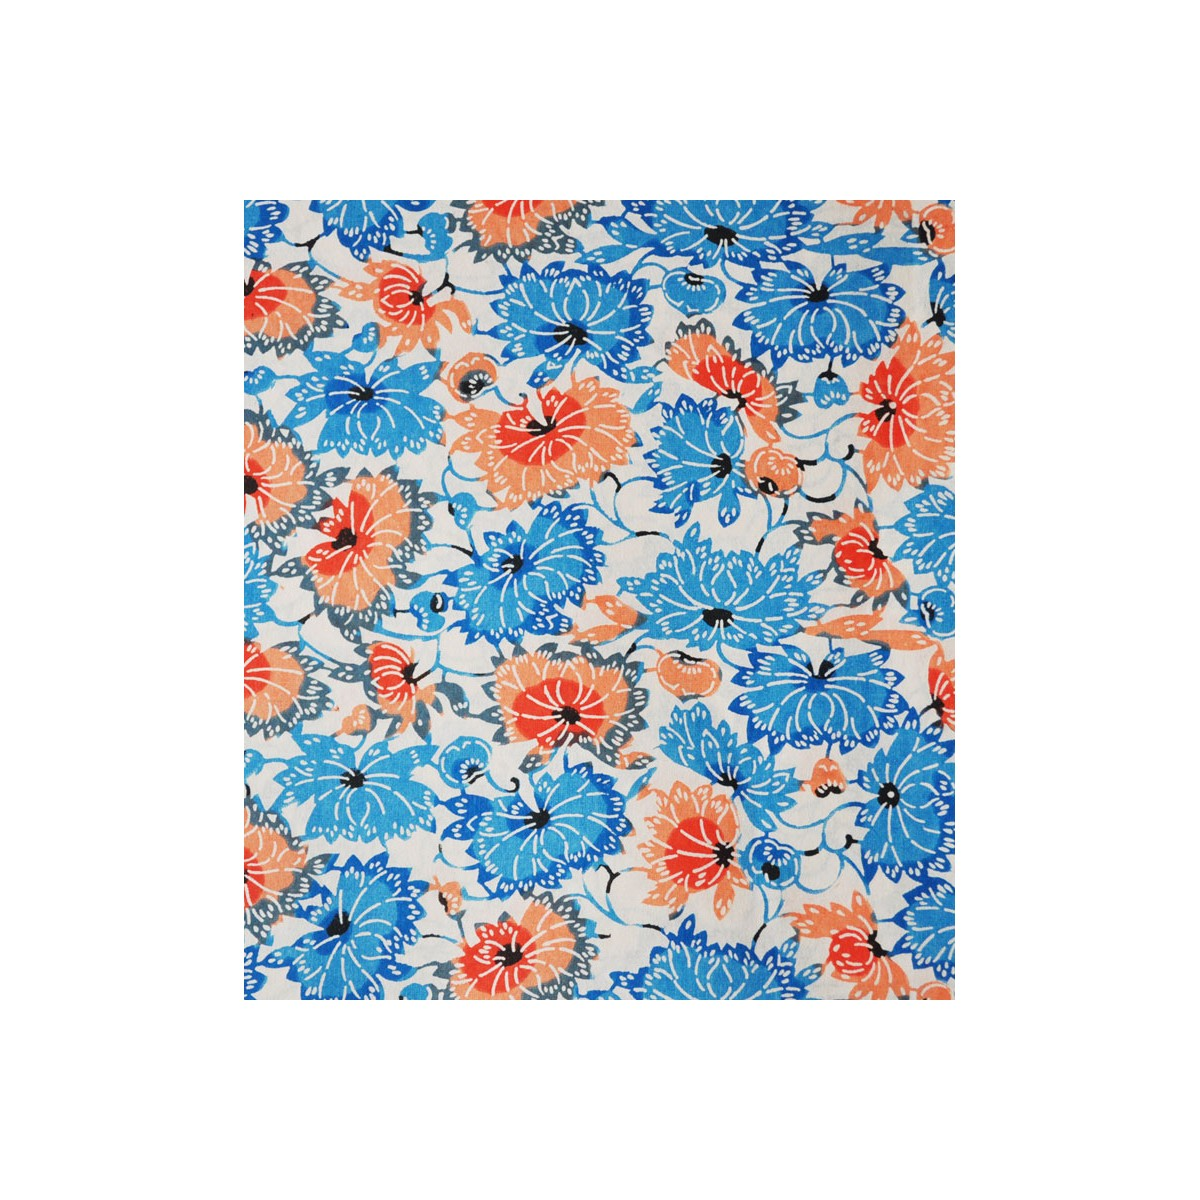 japanese paper origami paper papier japonais katazome katasome chrysanth me bleu. Black Bedroom Furniture Sets. Home Design Ideas